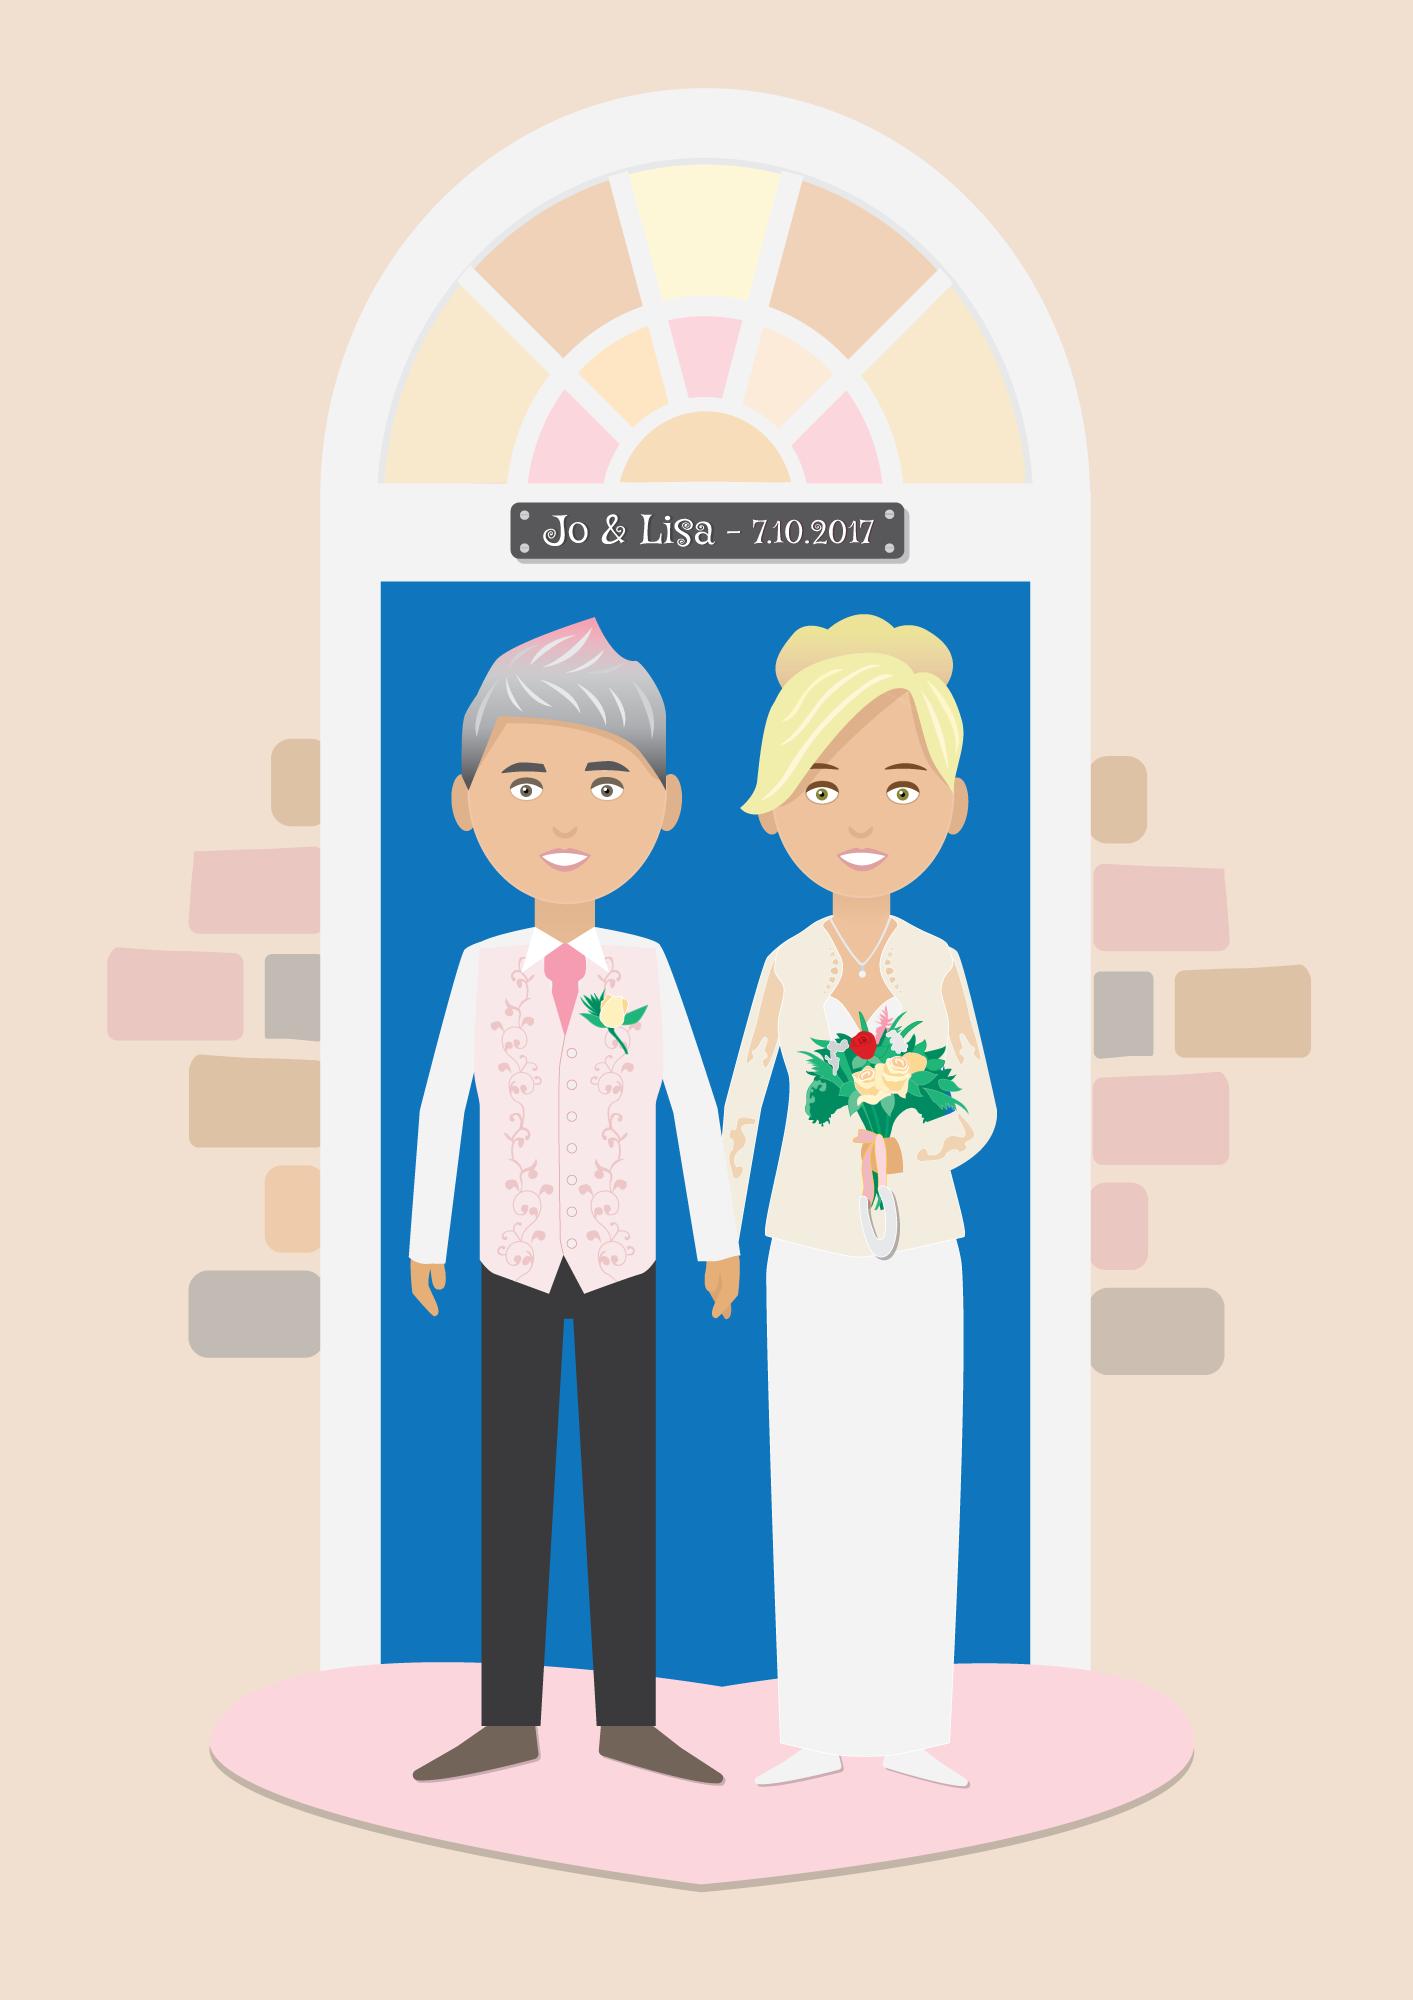 Jo & Lisa: Cartoon Wedding Portrait